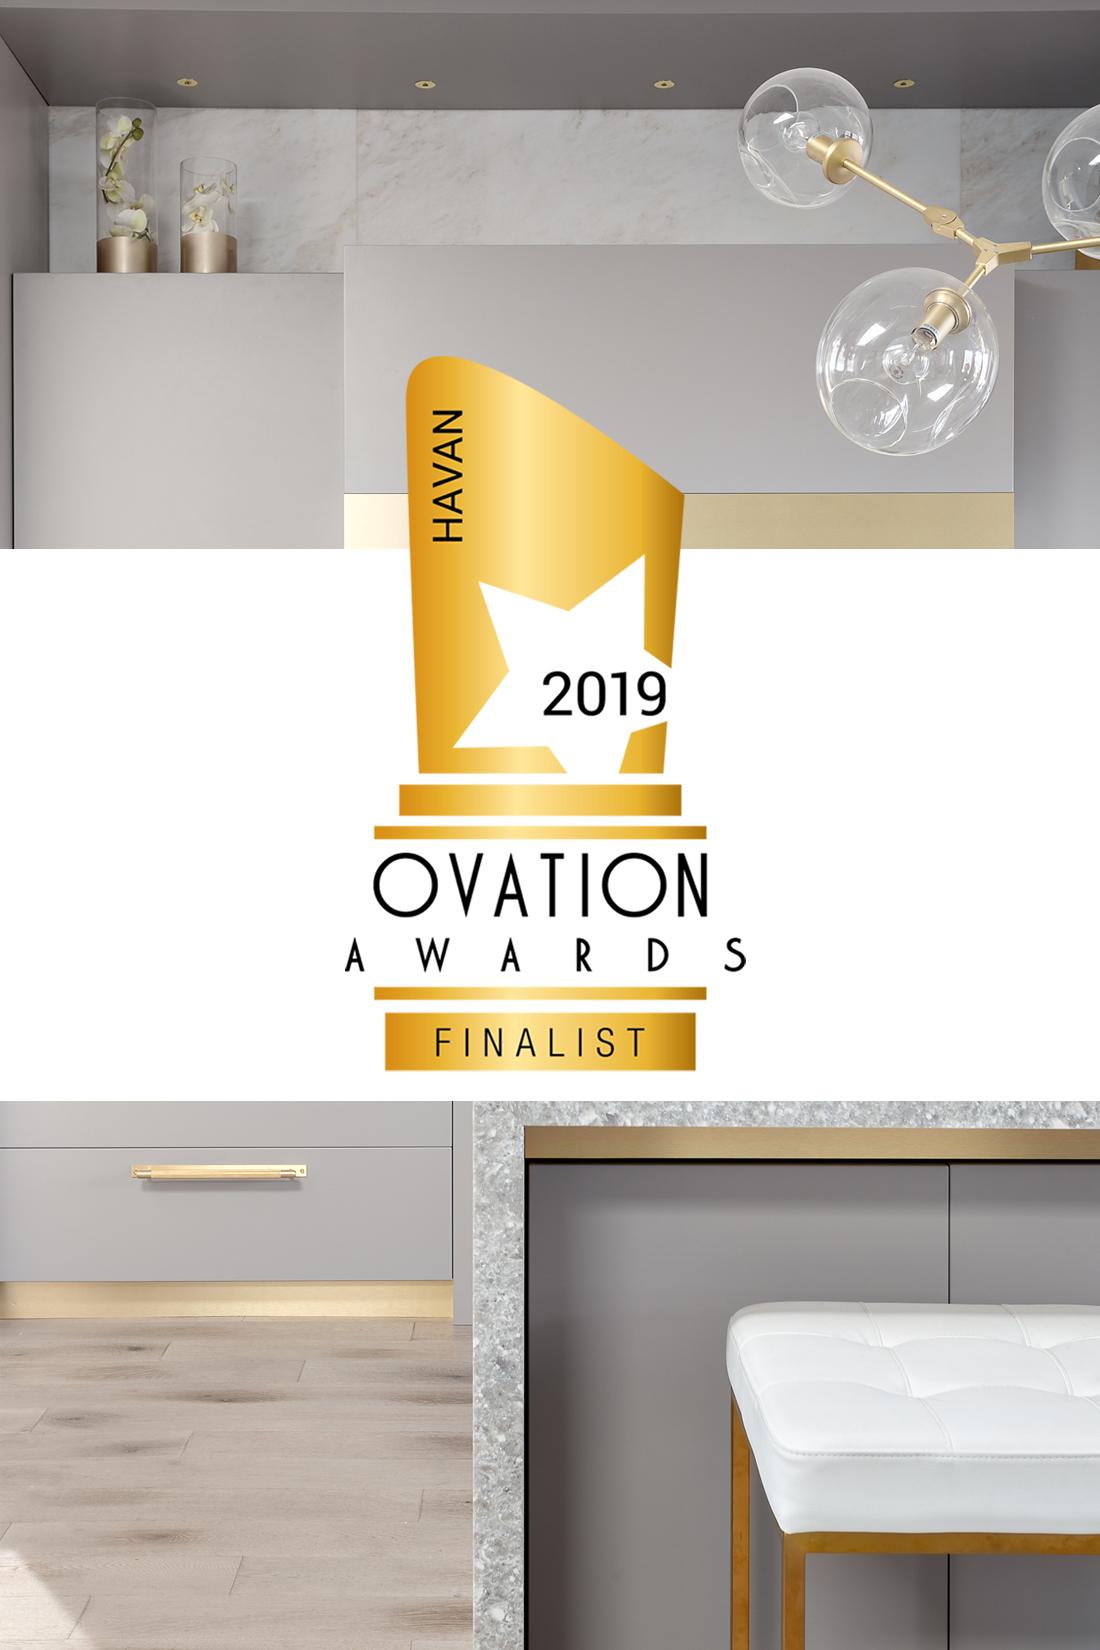 Ovation Awards Final.jpg